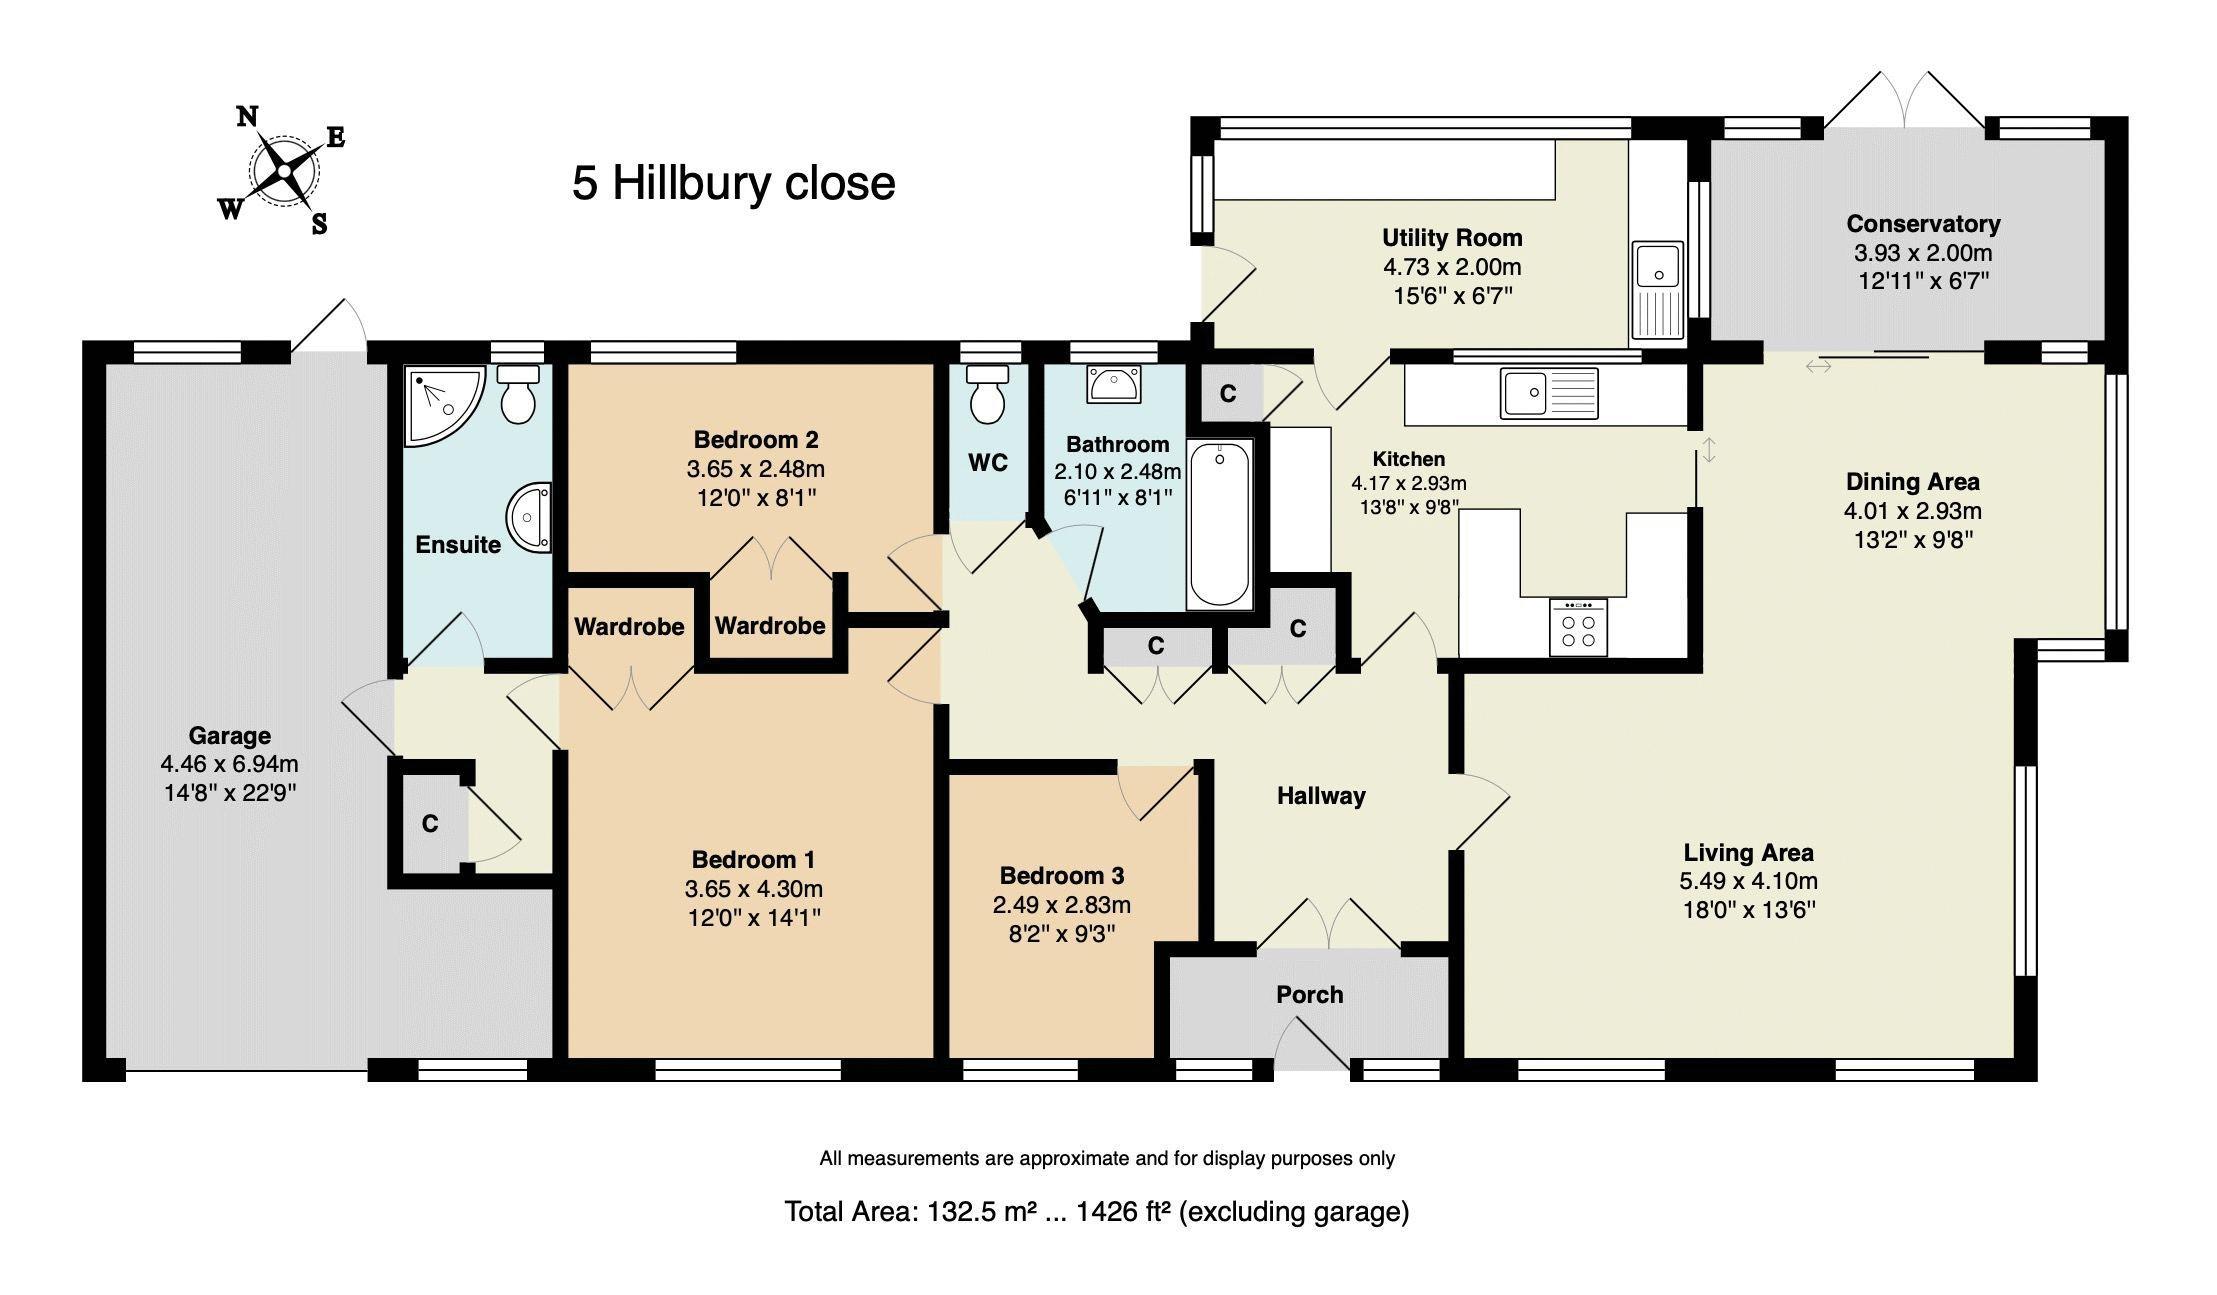 Hillbury Close